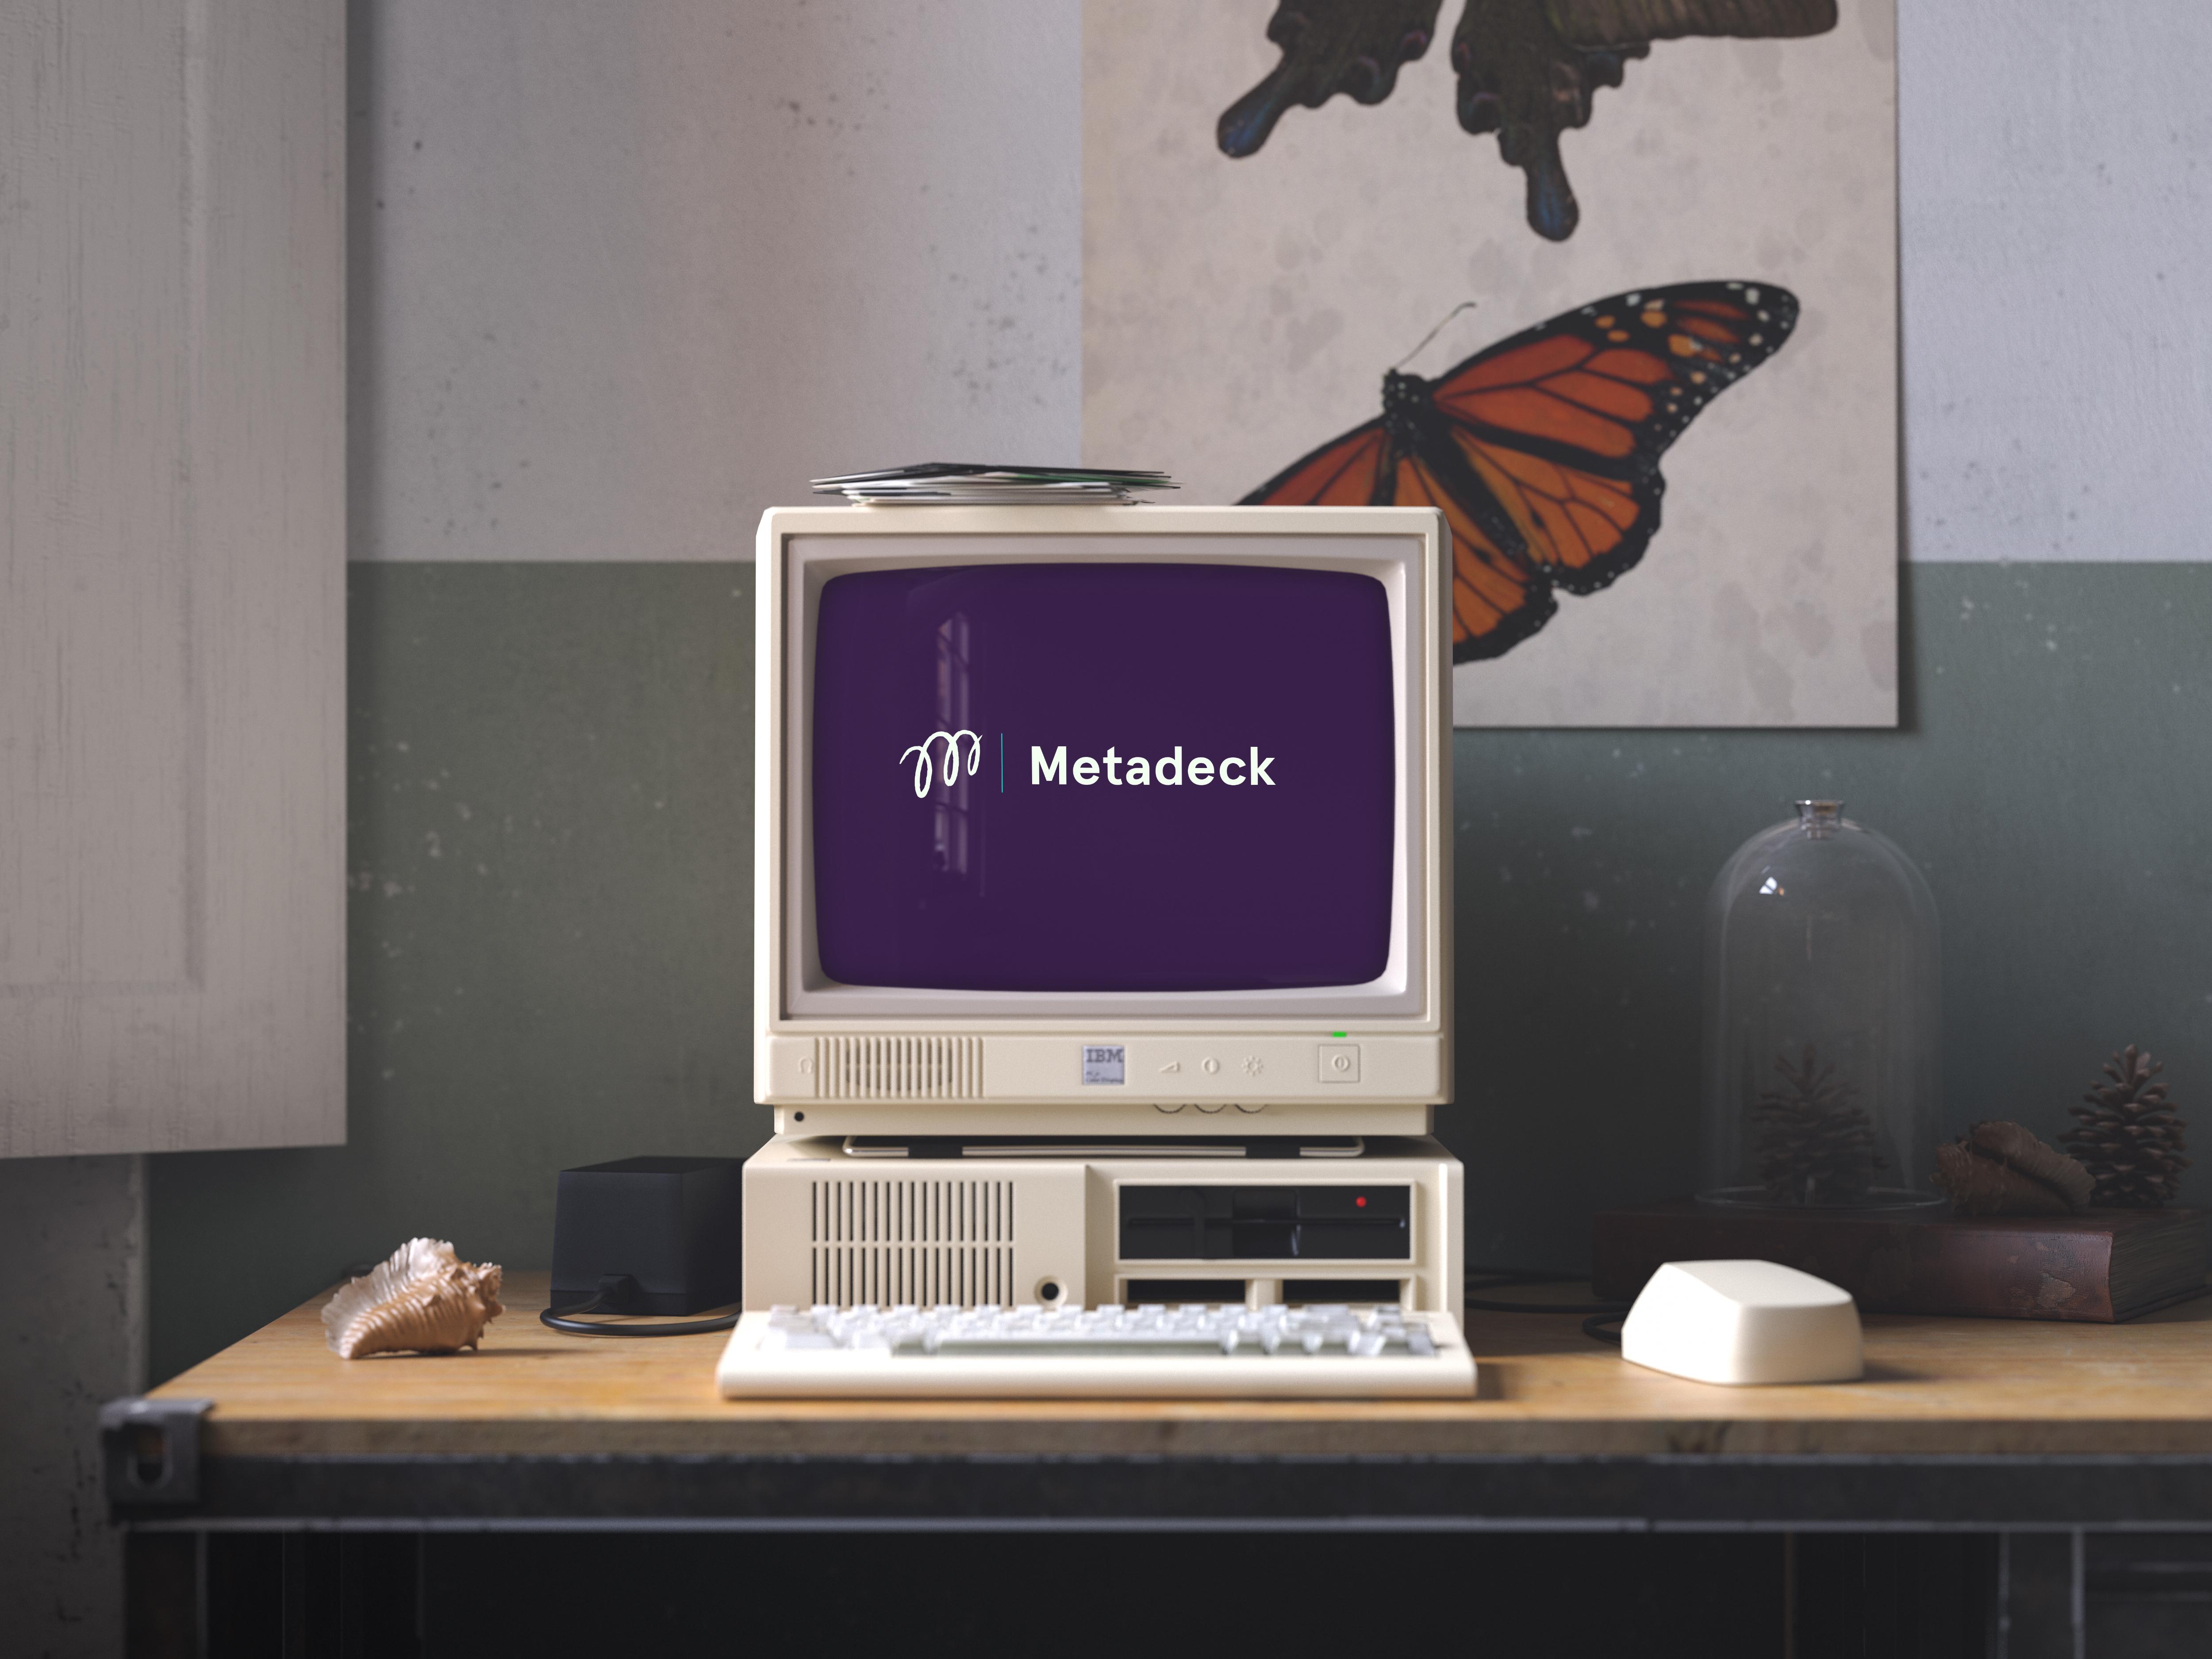 Cover image: Metadeck Logo